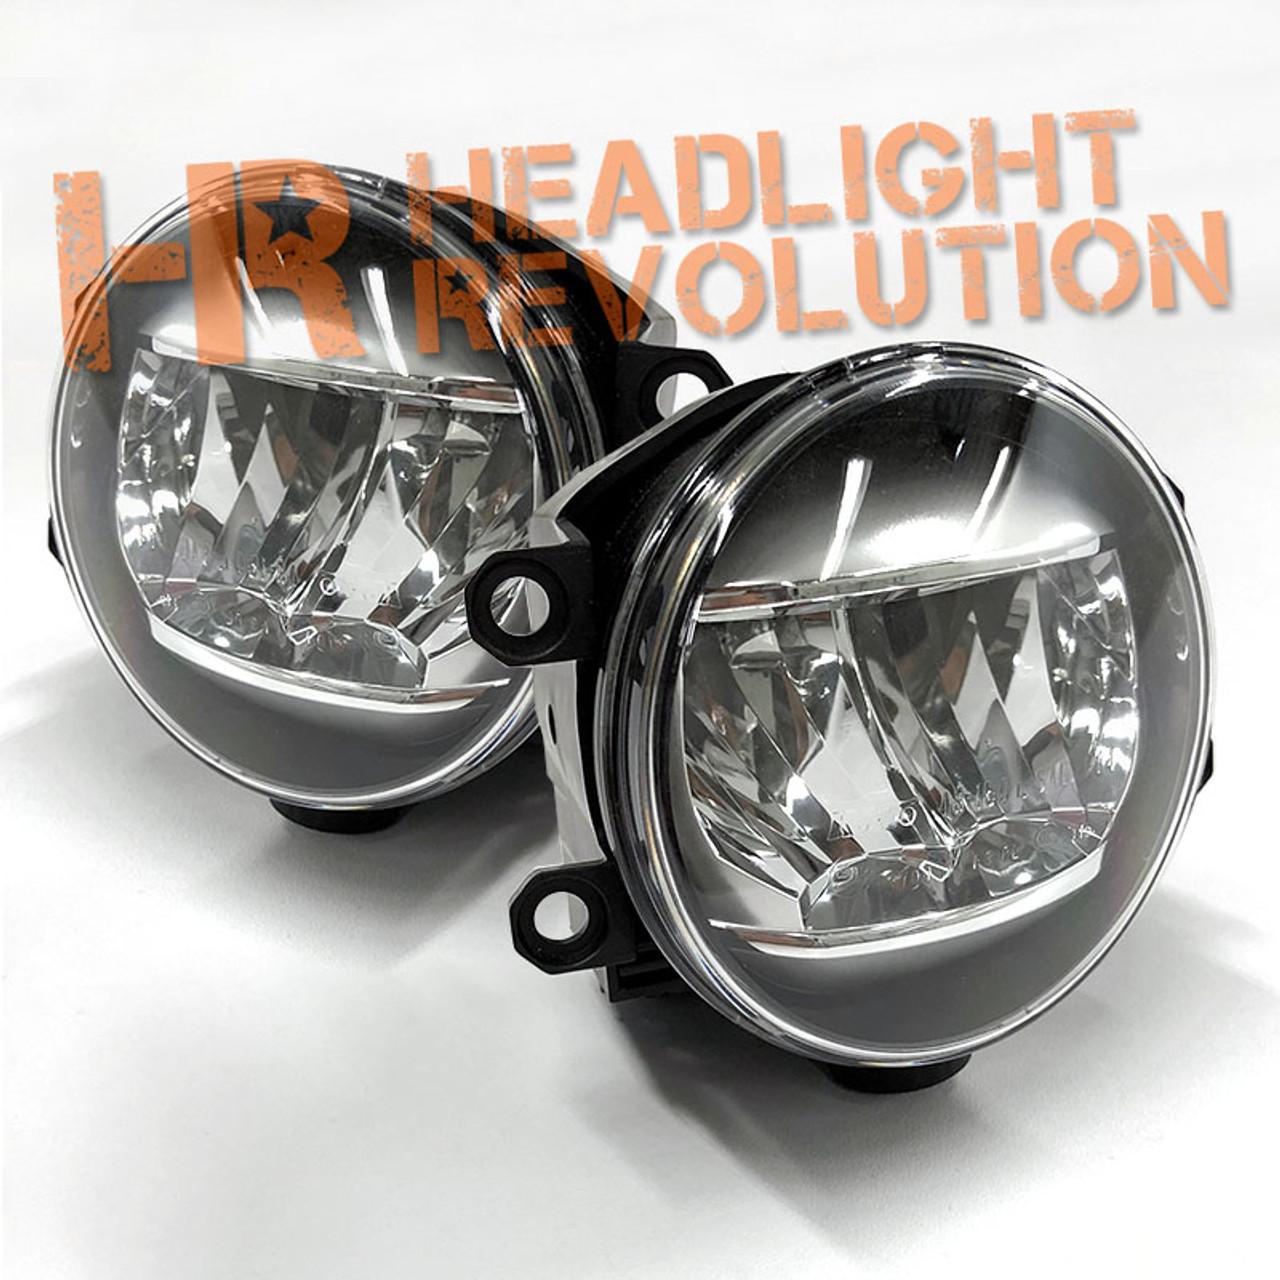 2014 - 2018 Toyota Tundra OEM LED Fog Light light Housing - Pair  F Oem Fog Light Wiring Harness on